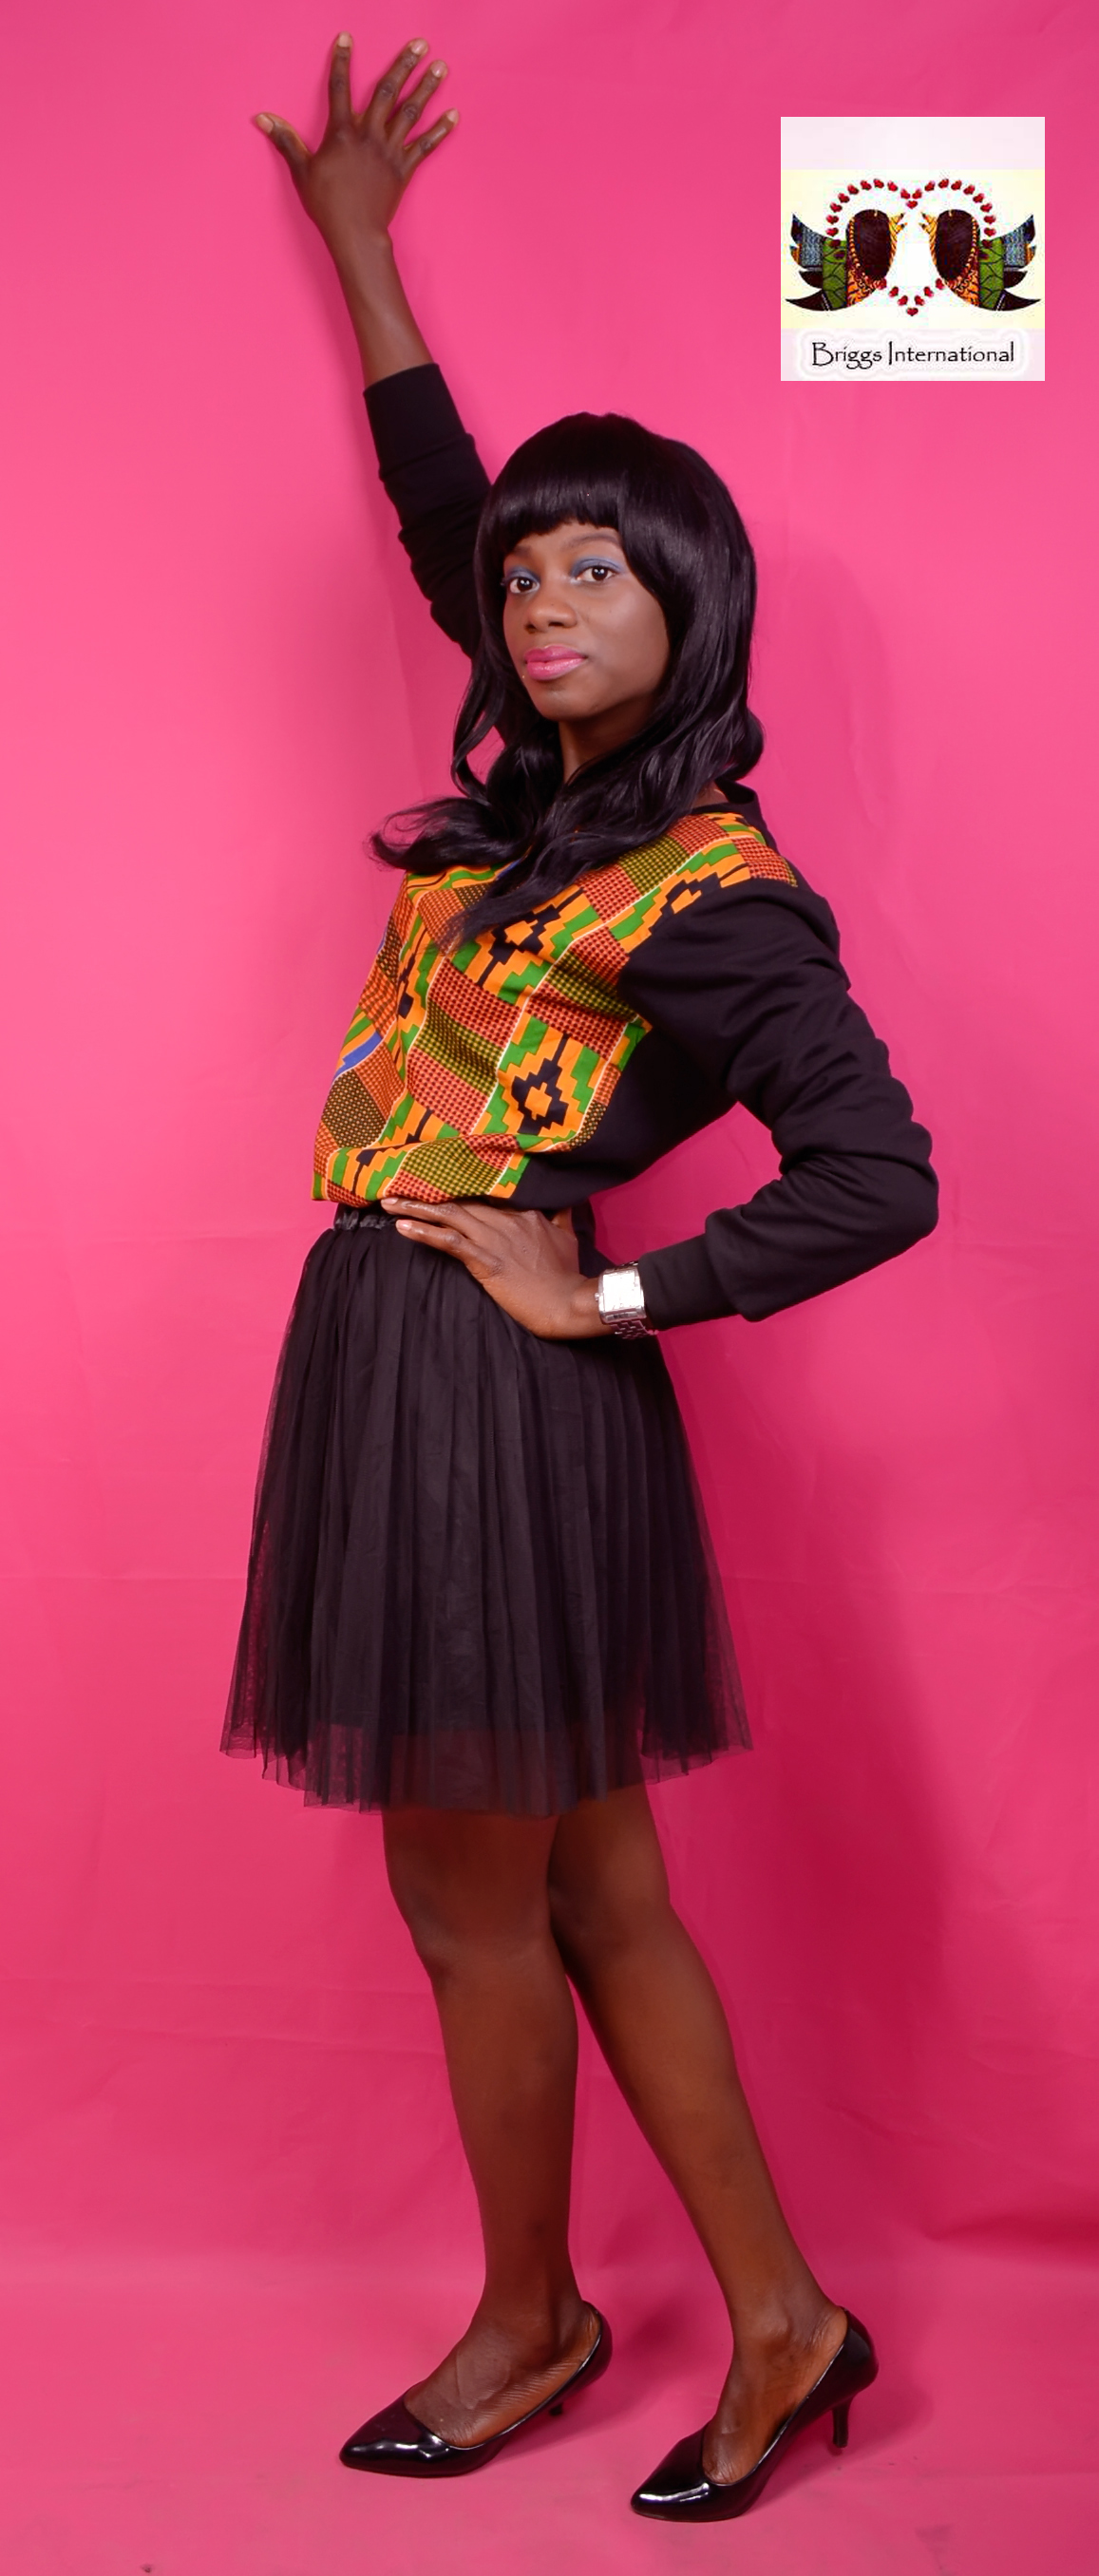 briggs international ceiling fan installation wiring diagram ankara sweat shirt on skirt enterprise